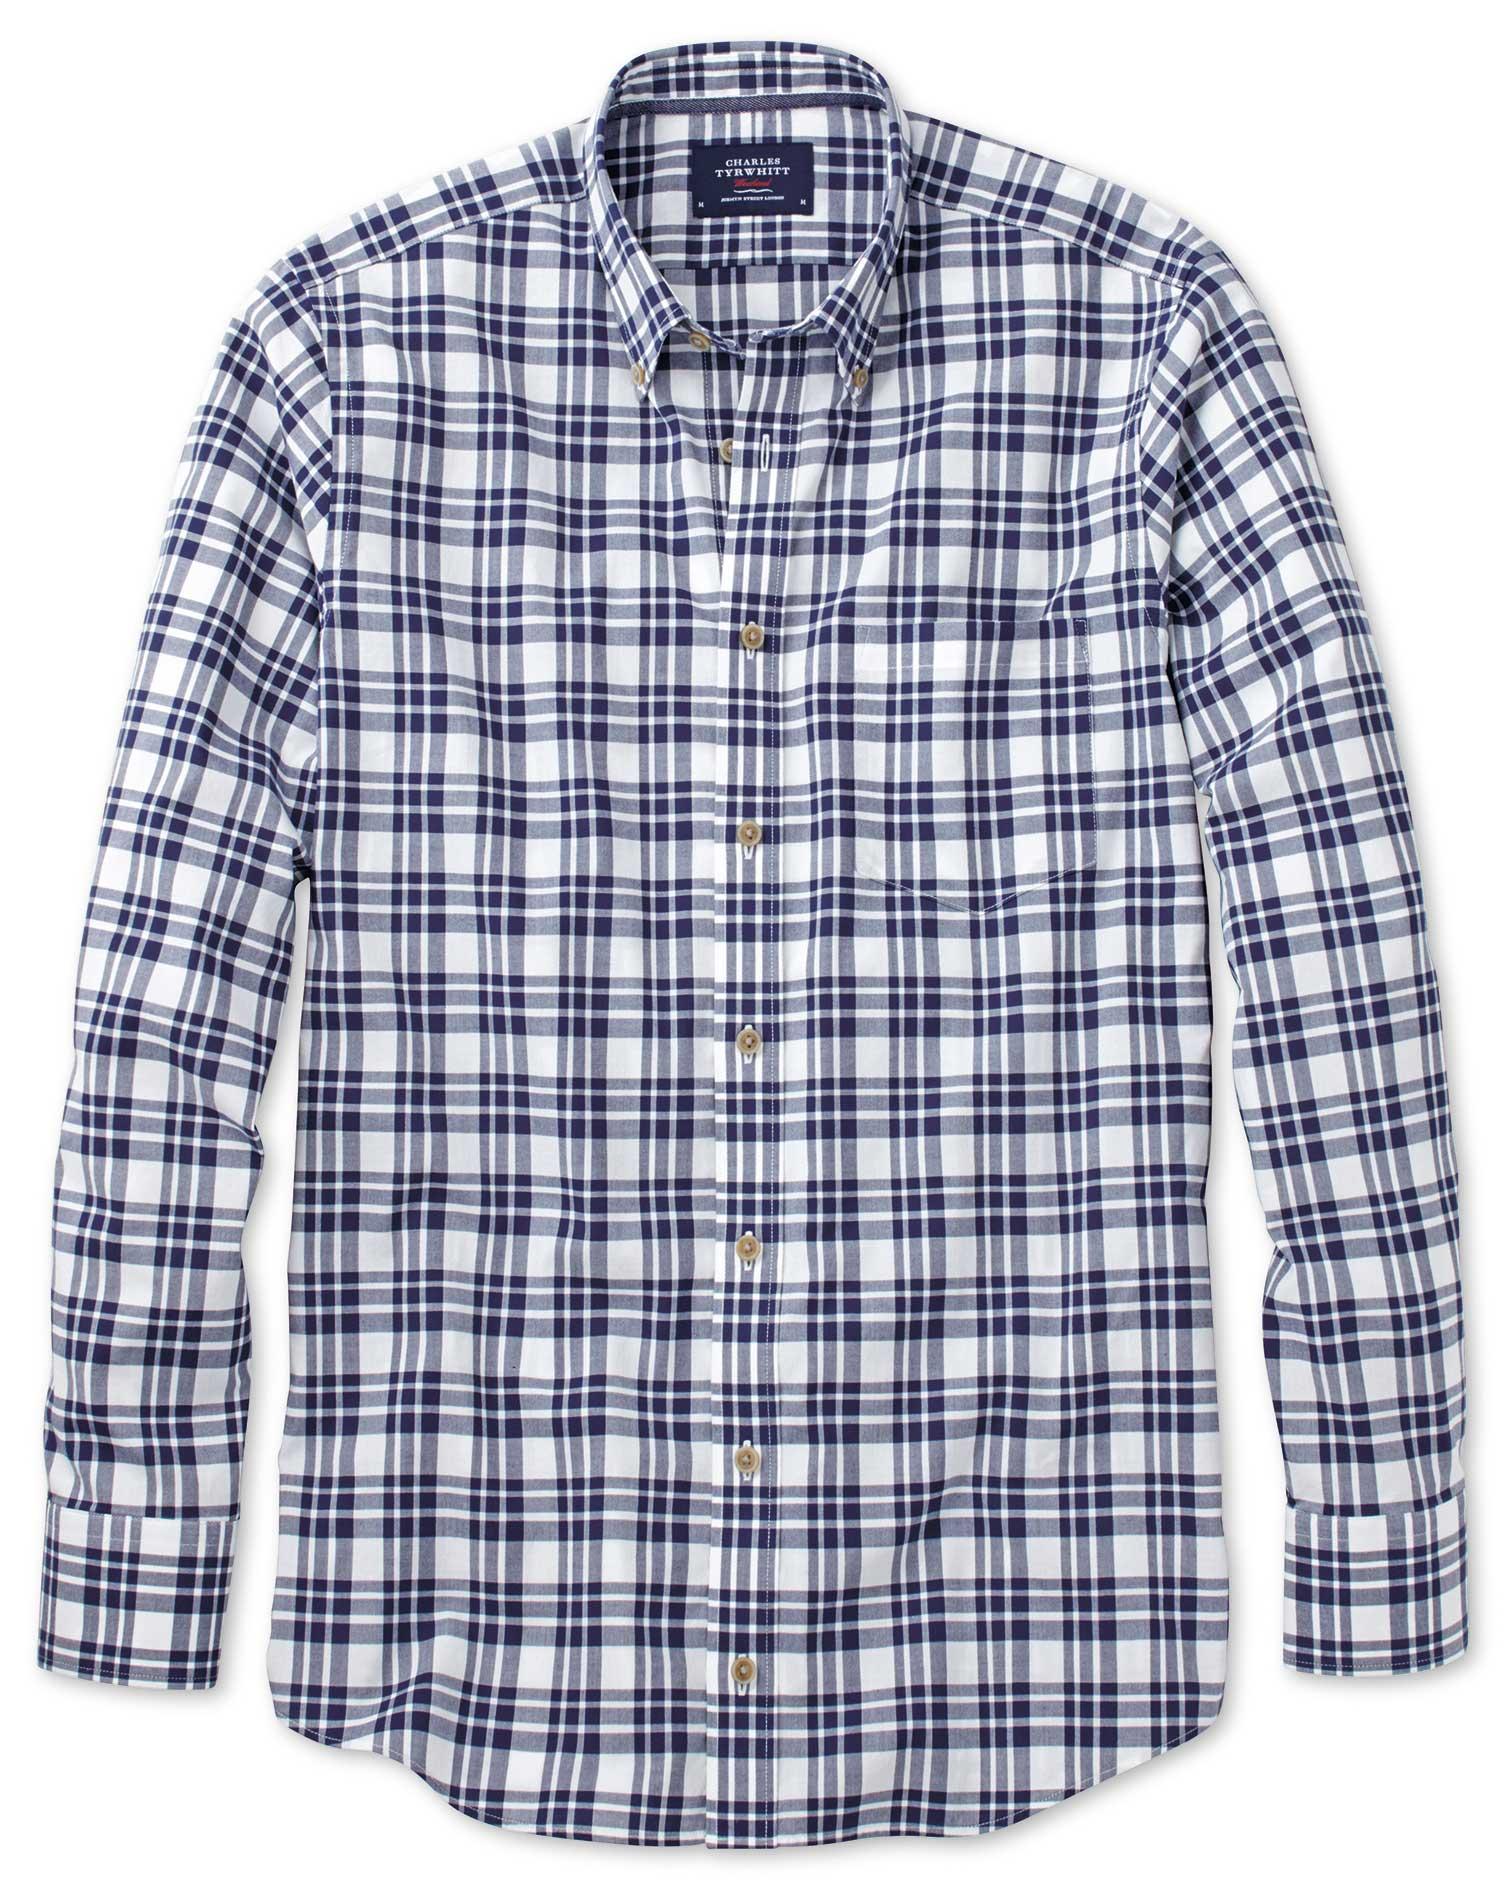 Classic Fit Button-Down Poplin Navy Blue Check Cotton Shirt Single Cuff Size XXL by Charles Tyrwhitt